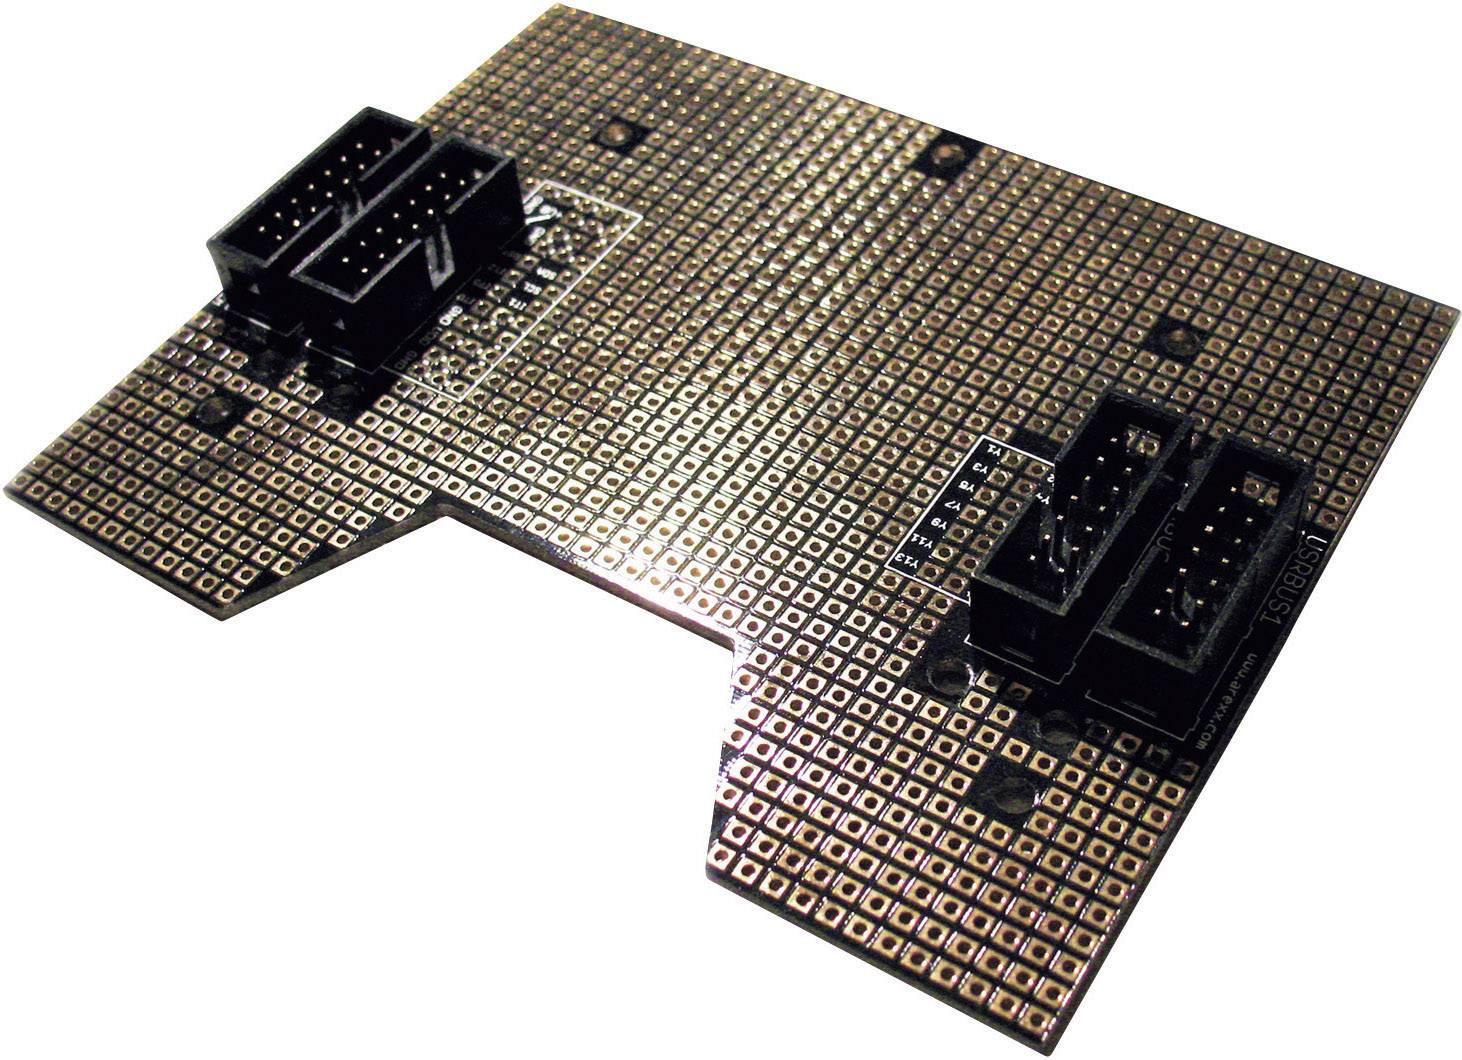 Experimentální deska Arexx RP6 pro robotické systémy